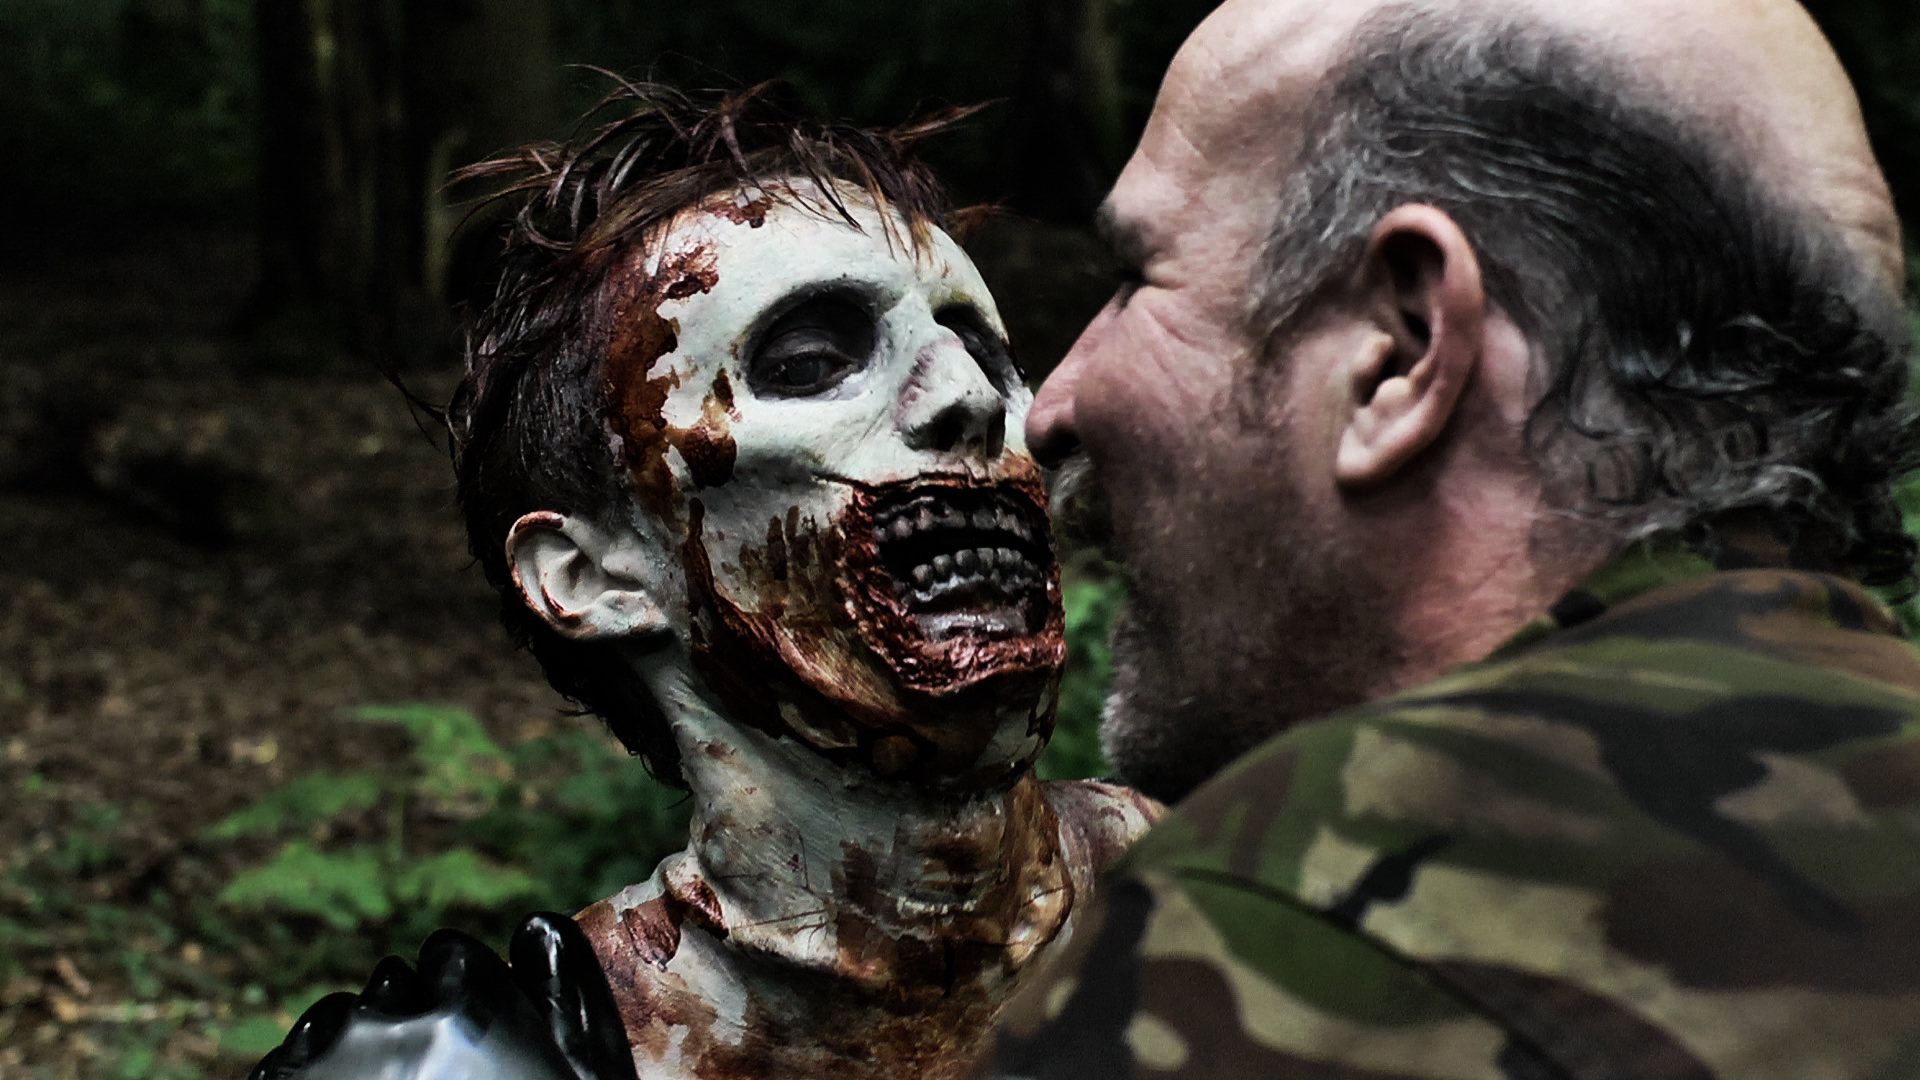 https://i0.wp.com/roberthood.net/blog/wp-content/uploads/2012/02/Zombie-Resurrection-Mac-and-Zombie.jpg